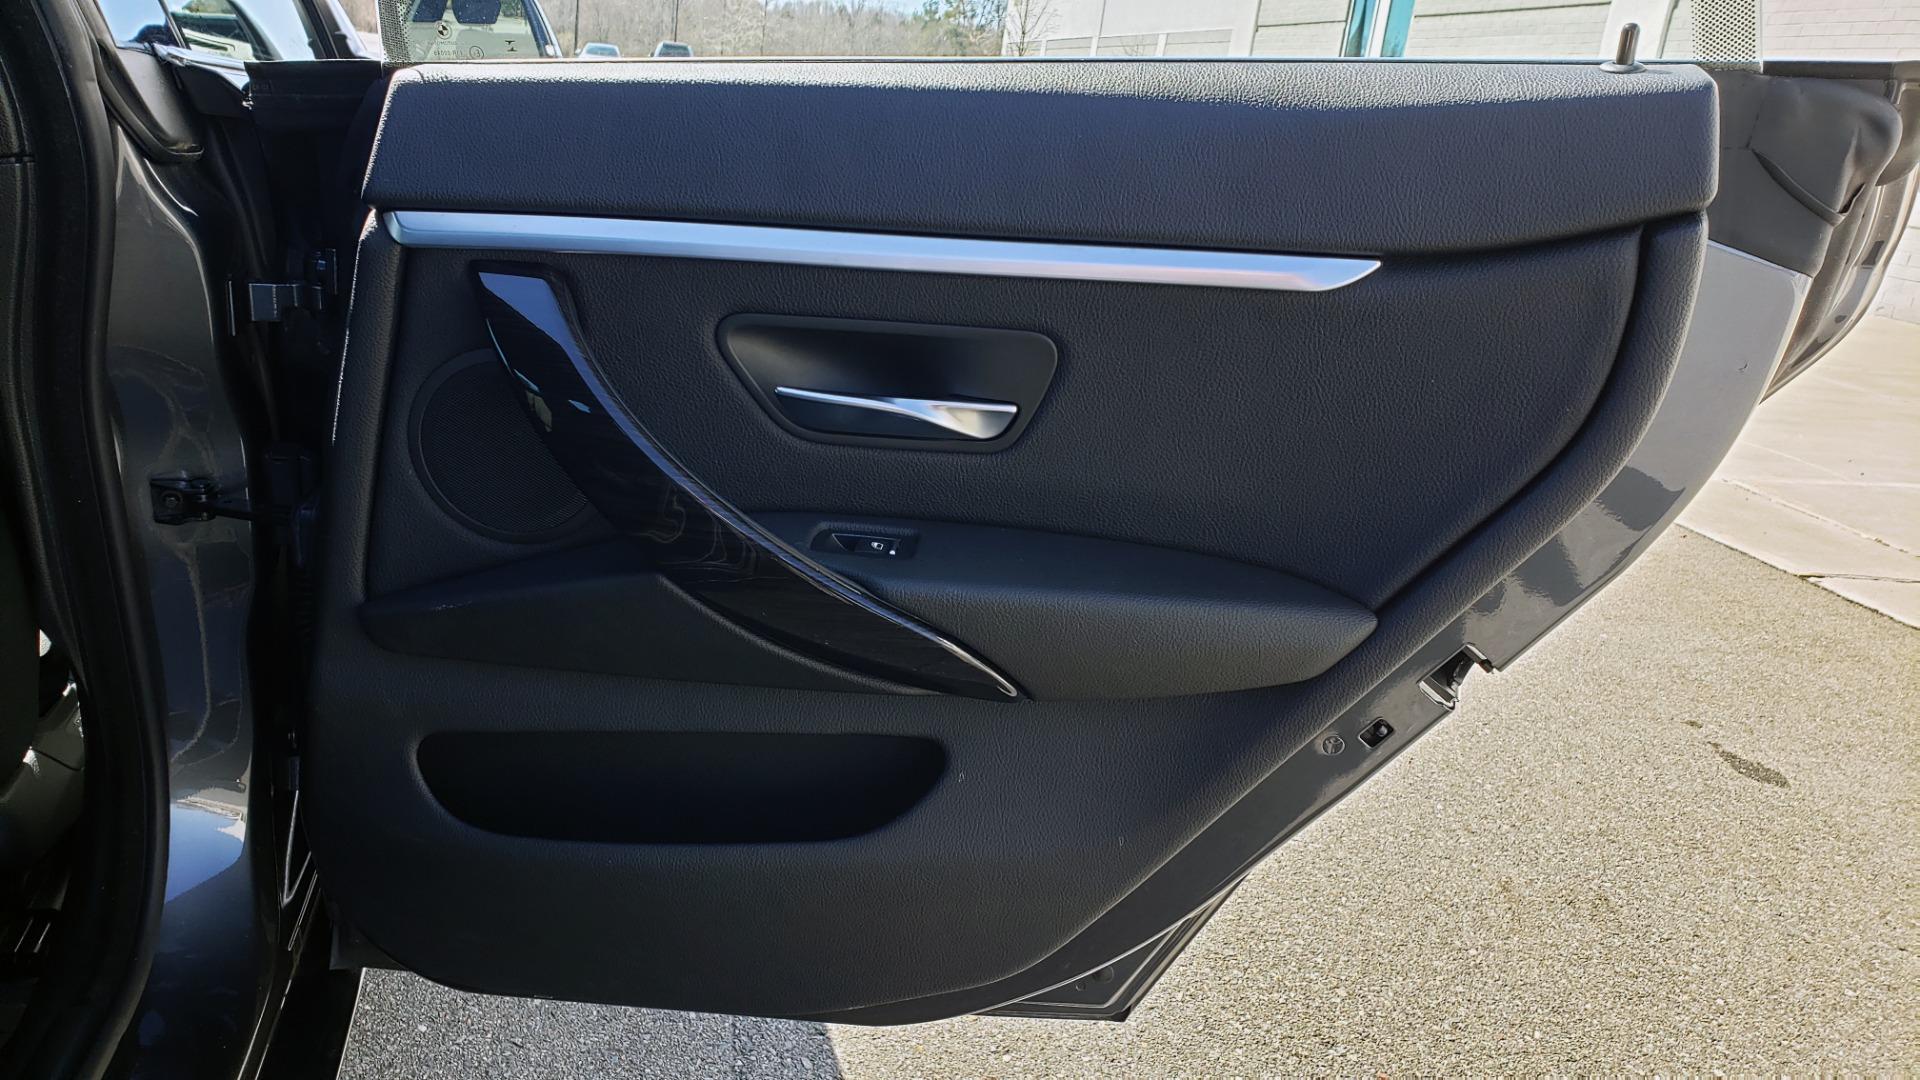 Used 2018 BMW 4 SERIES 430IXDRIVE / PREMIUM / NAV / SUNROOF / ESSENTIALS PKG for sale $29,495 at Formula Imports in Charlotte NC 28227 69